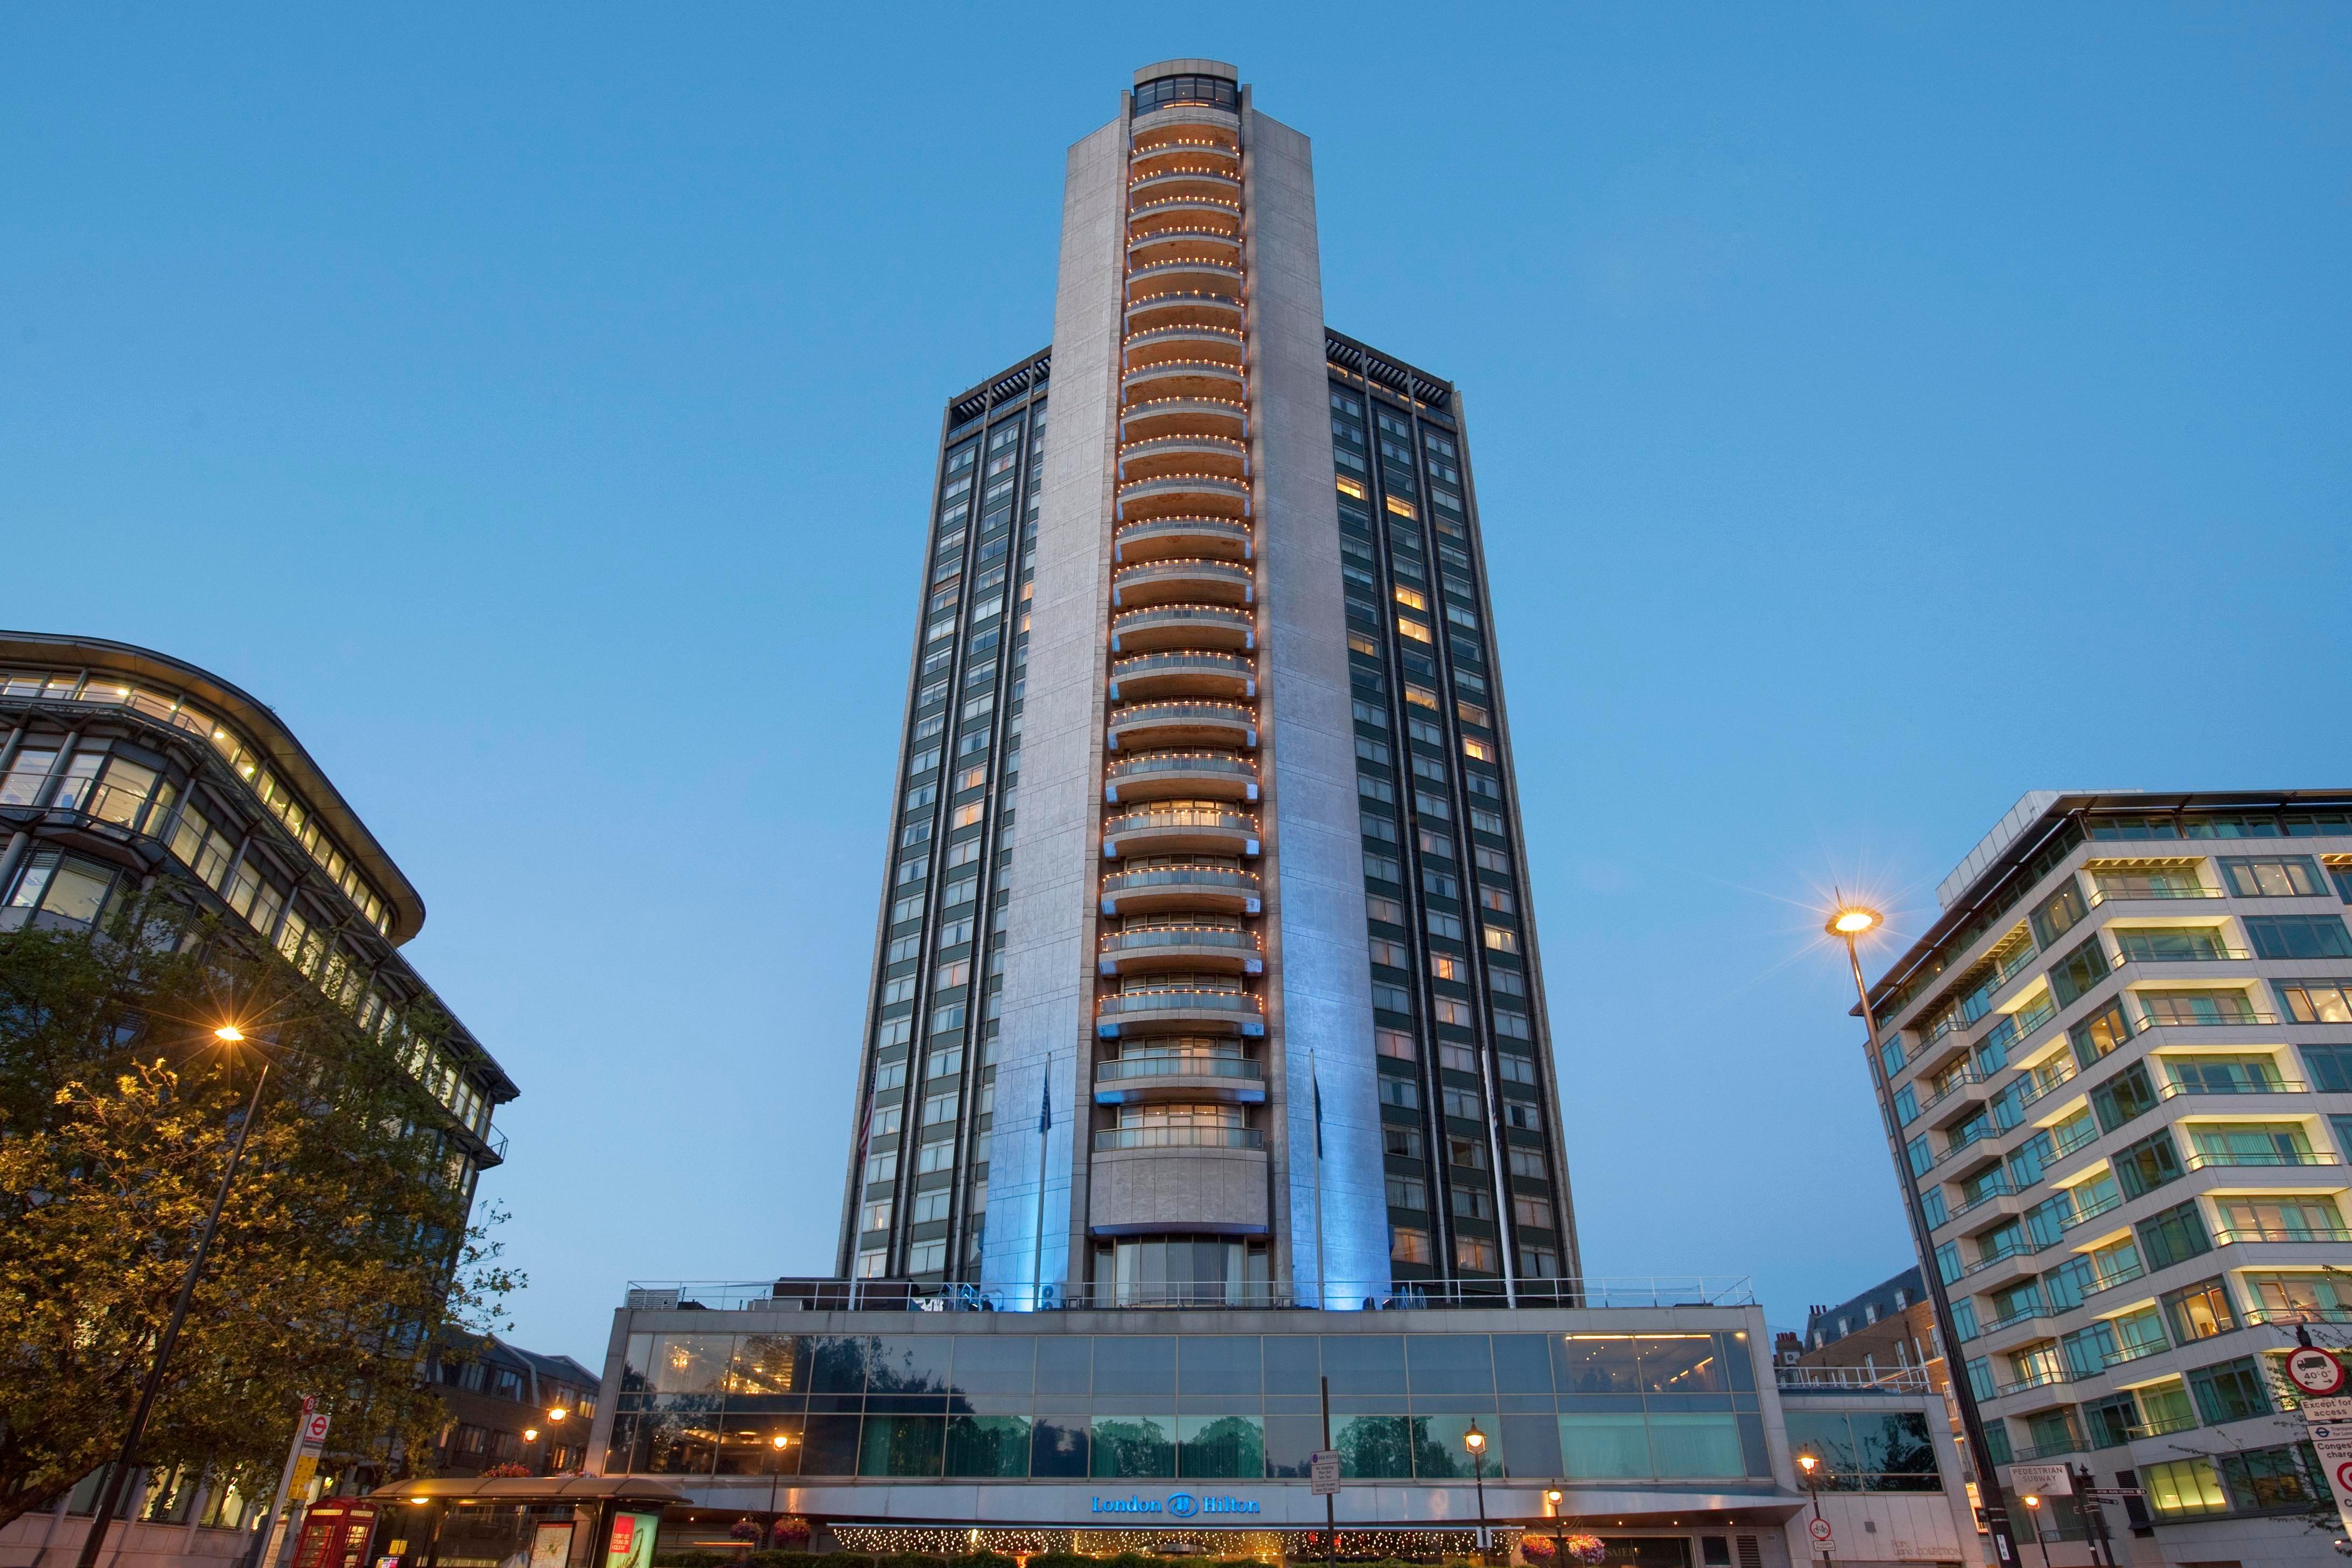 Hilton Park Lane hotel